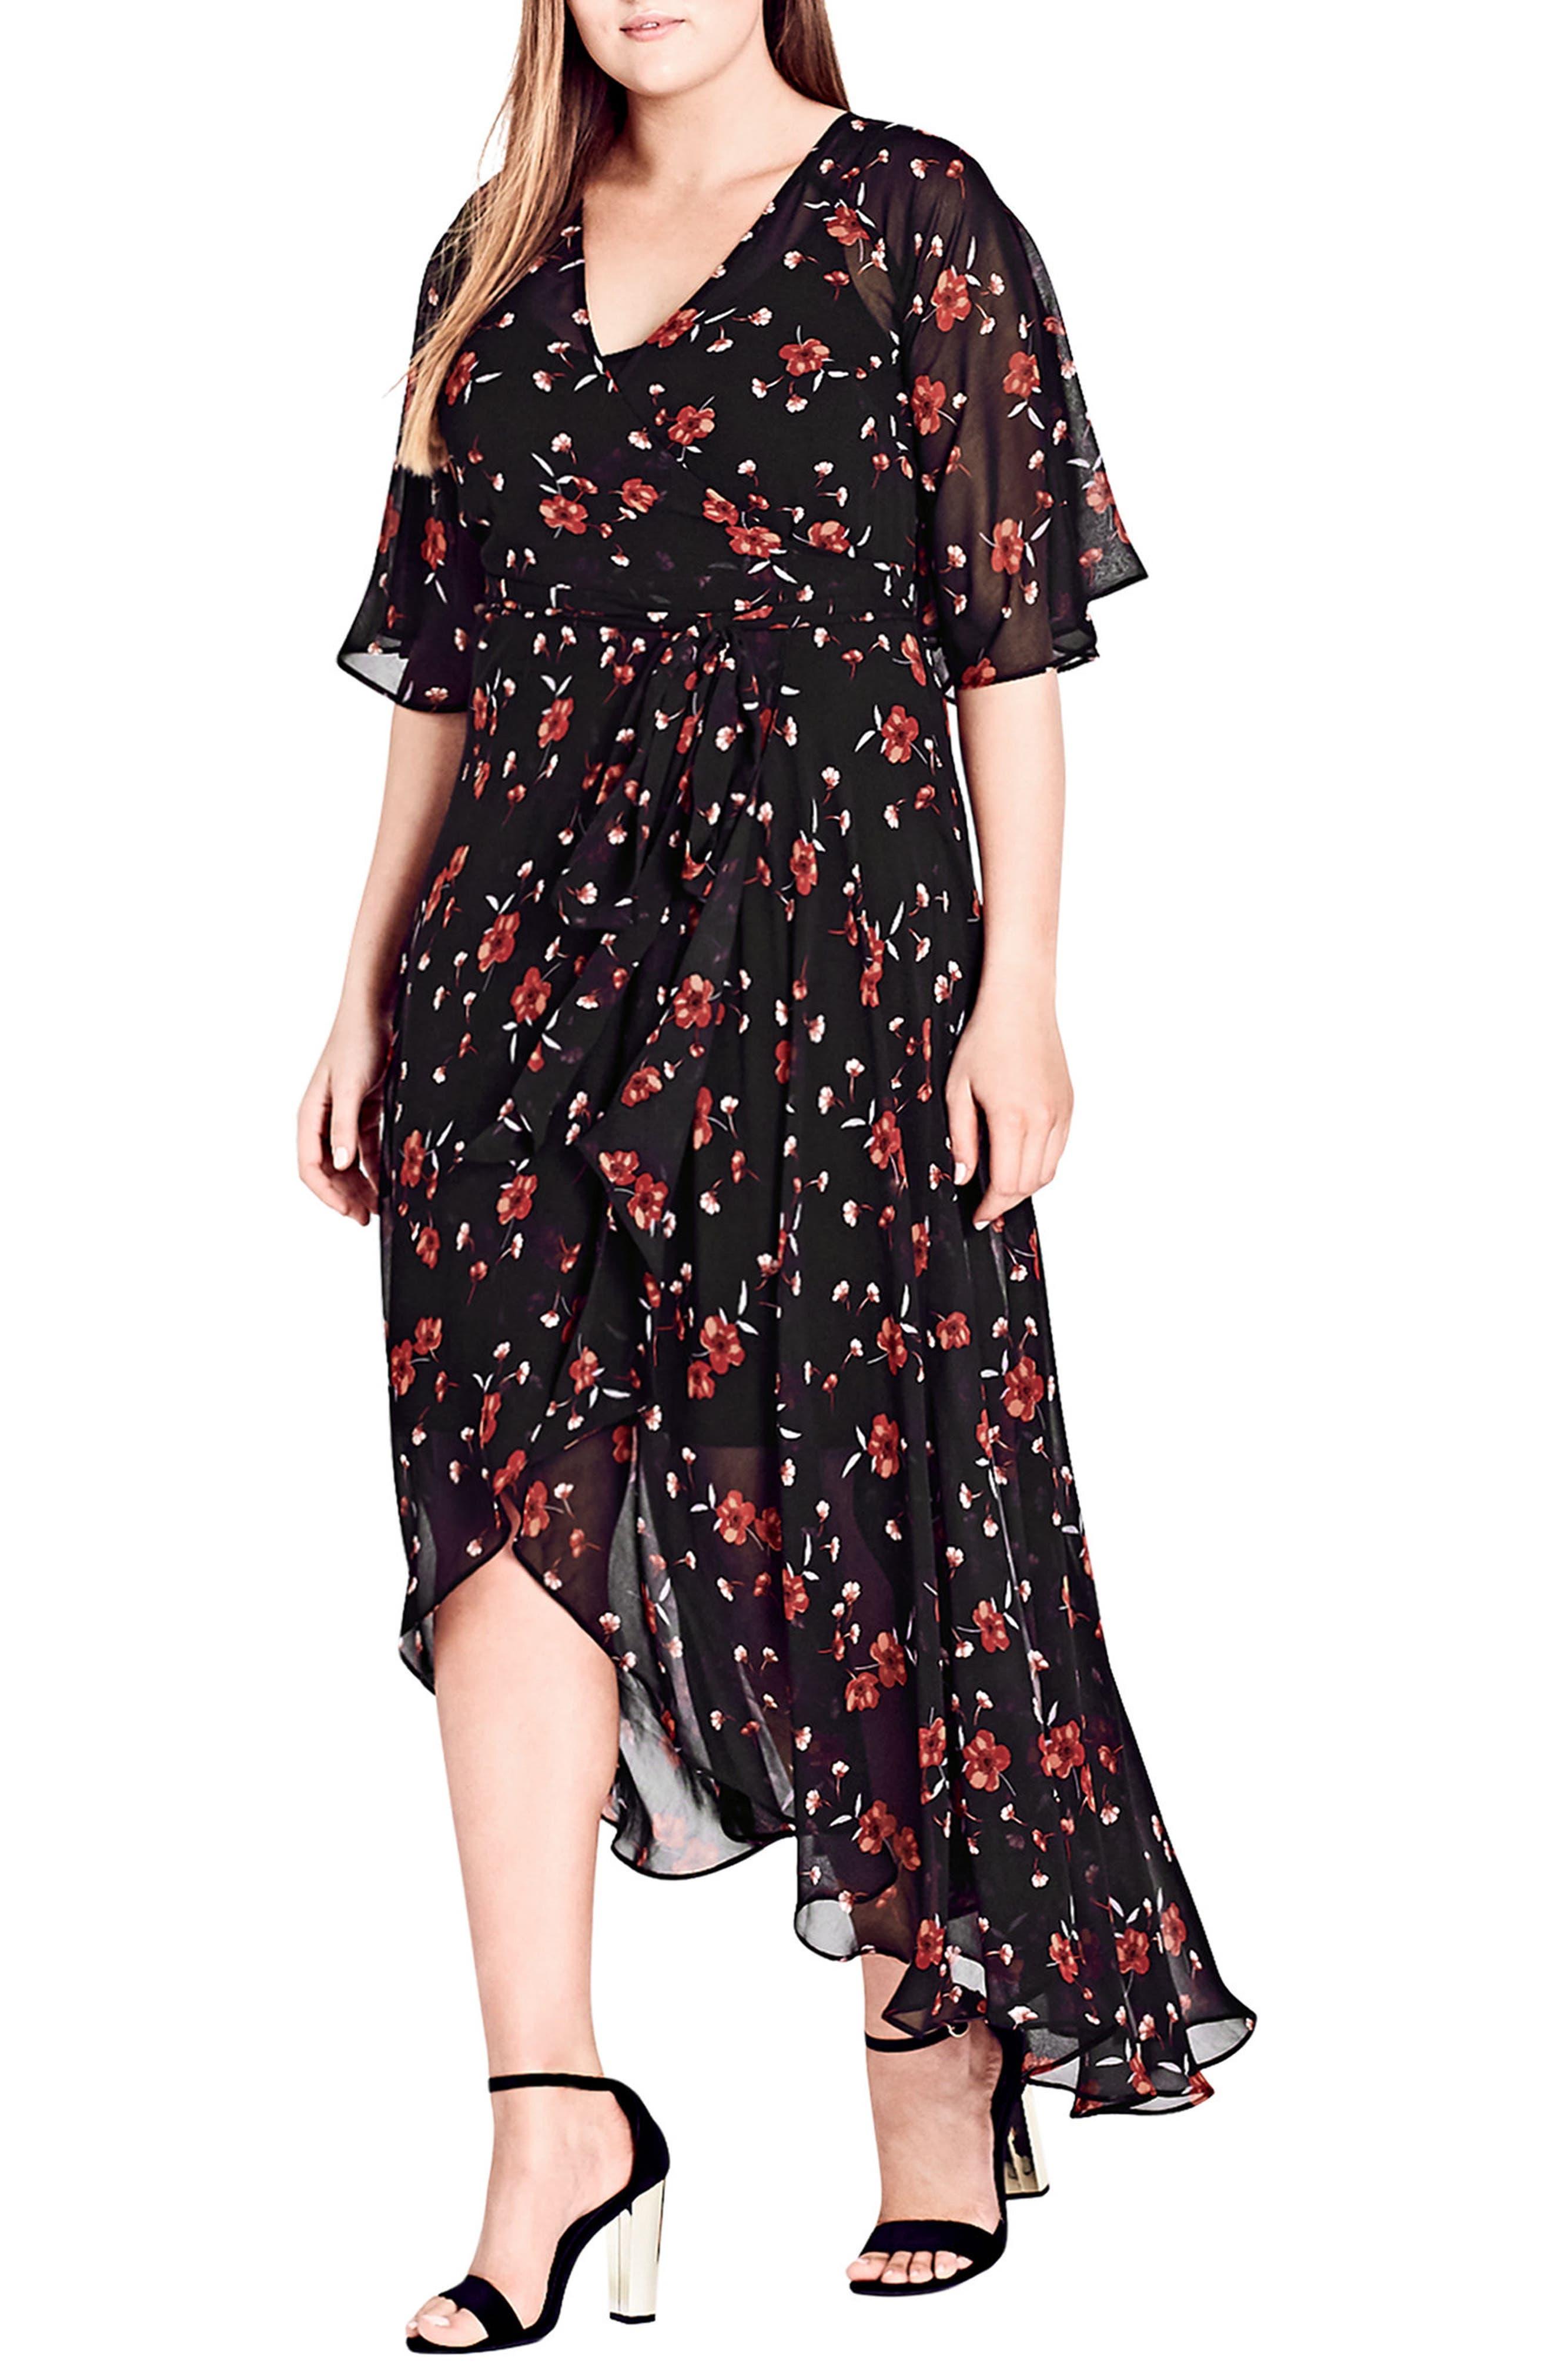 Fall in Love Floral Maxi Dress,                             Main thumbnail 1, color,                             BLACK